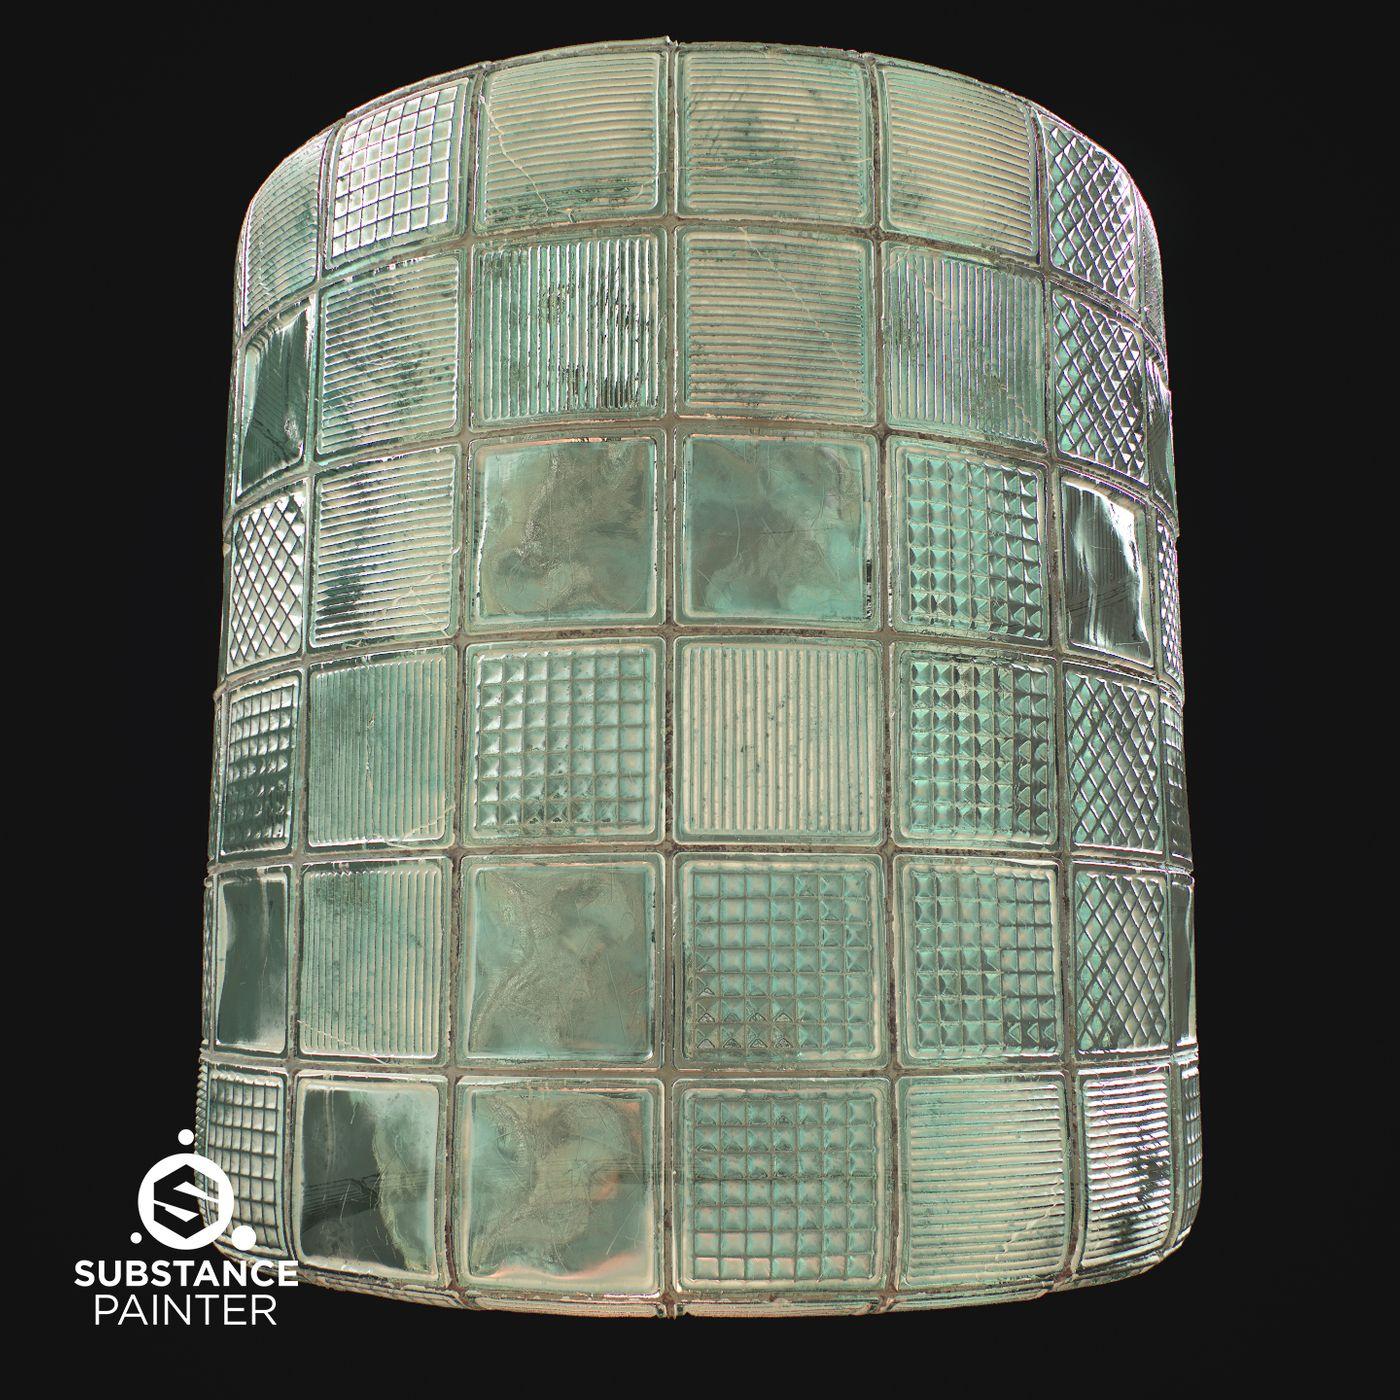 Glass Block Wall Cyl 001 Davidhartmann